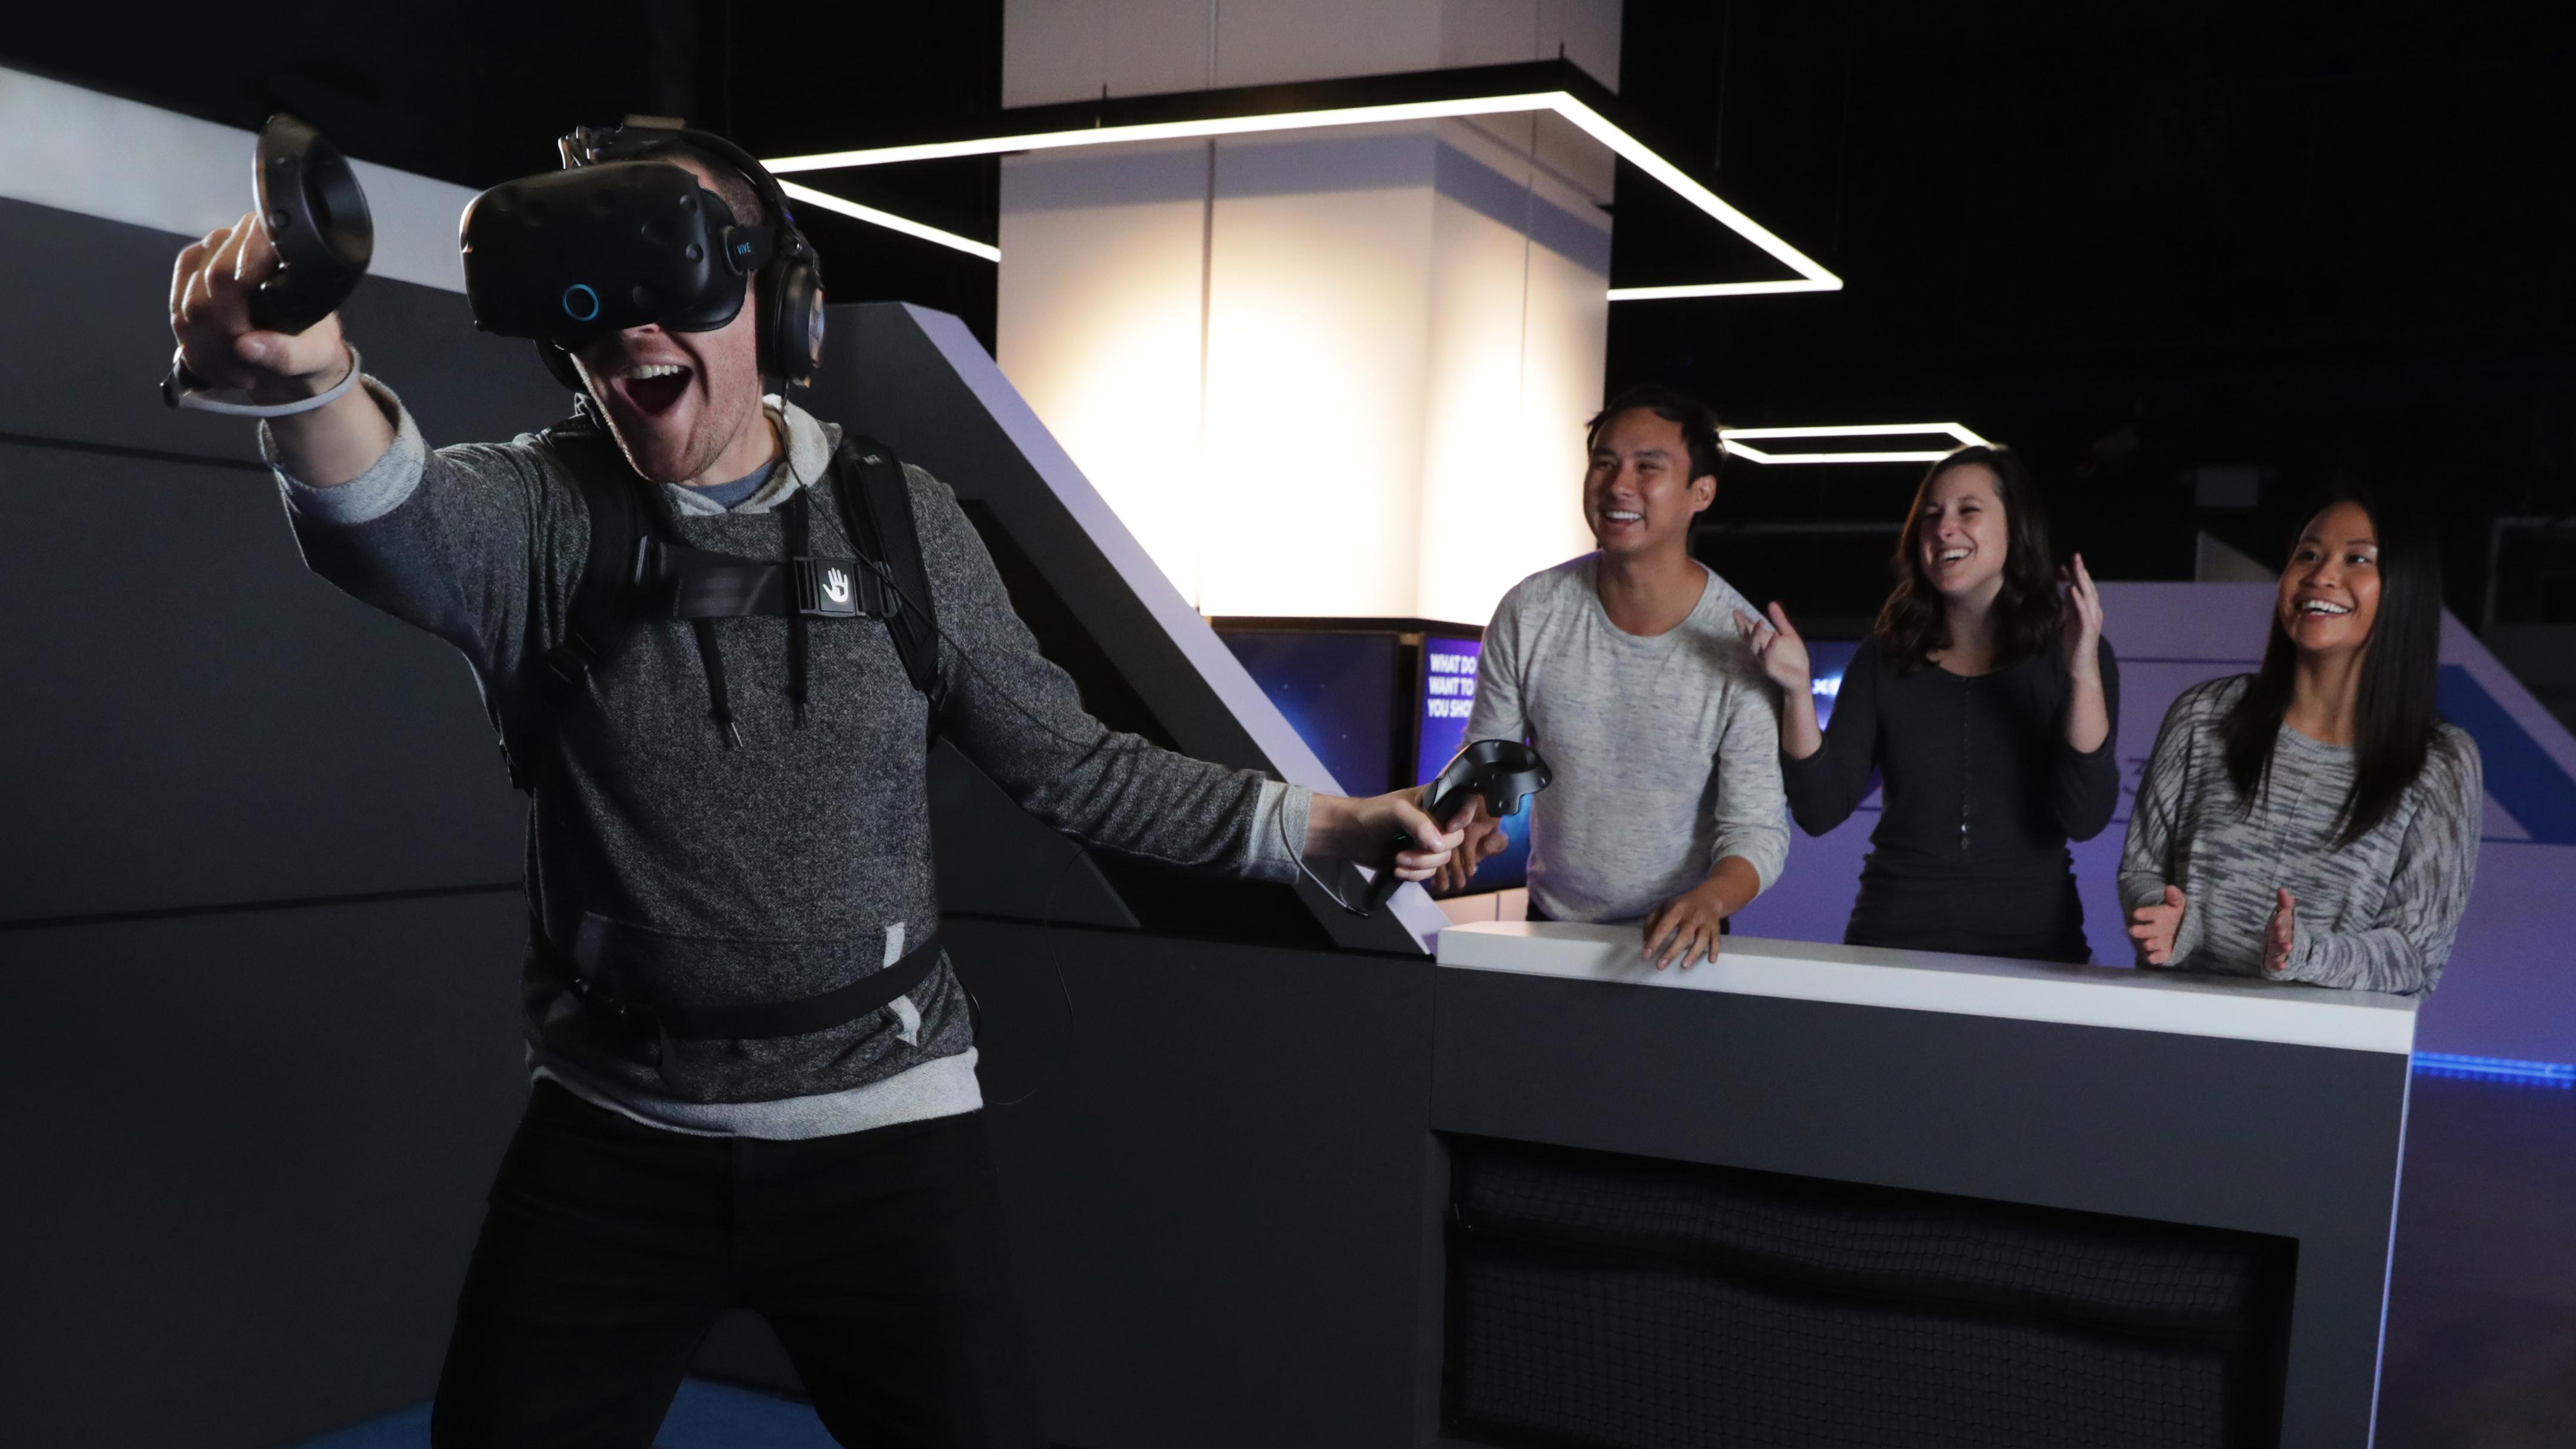 IMAX pulls the plug on its virtual reality arcade business